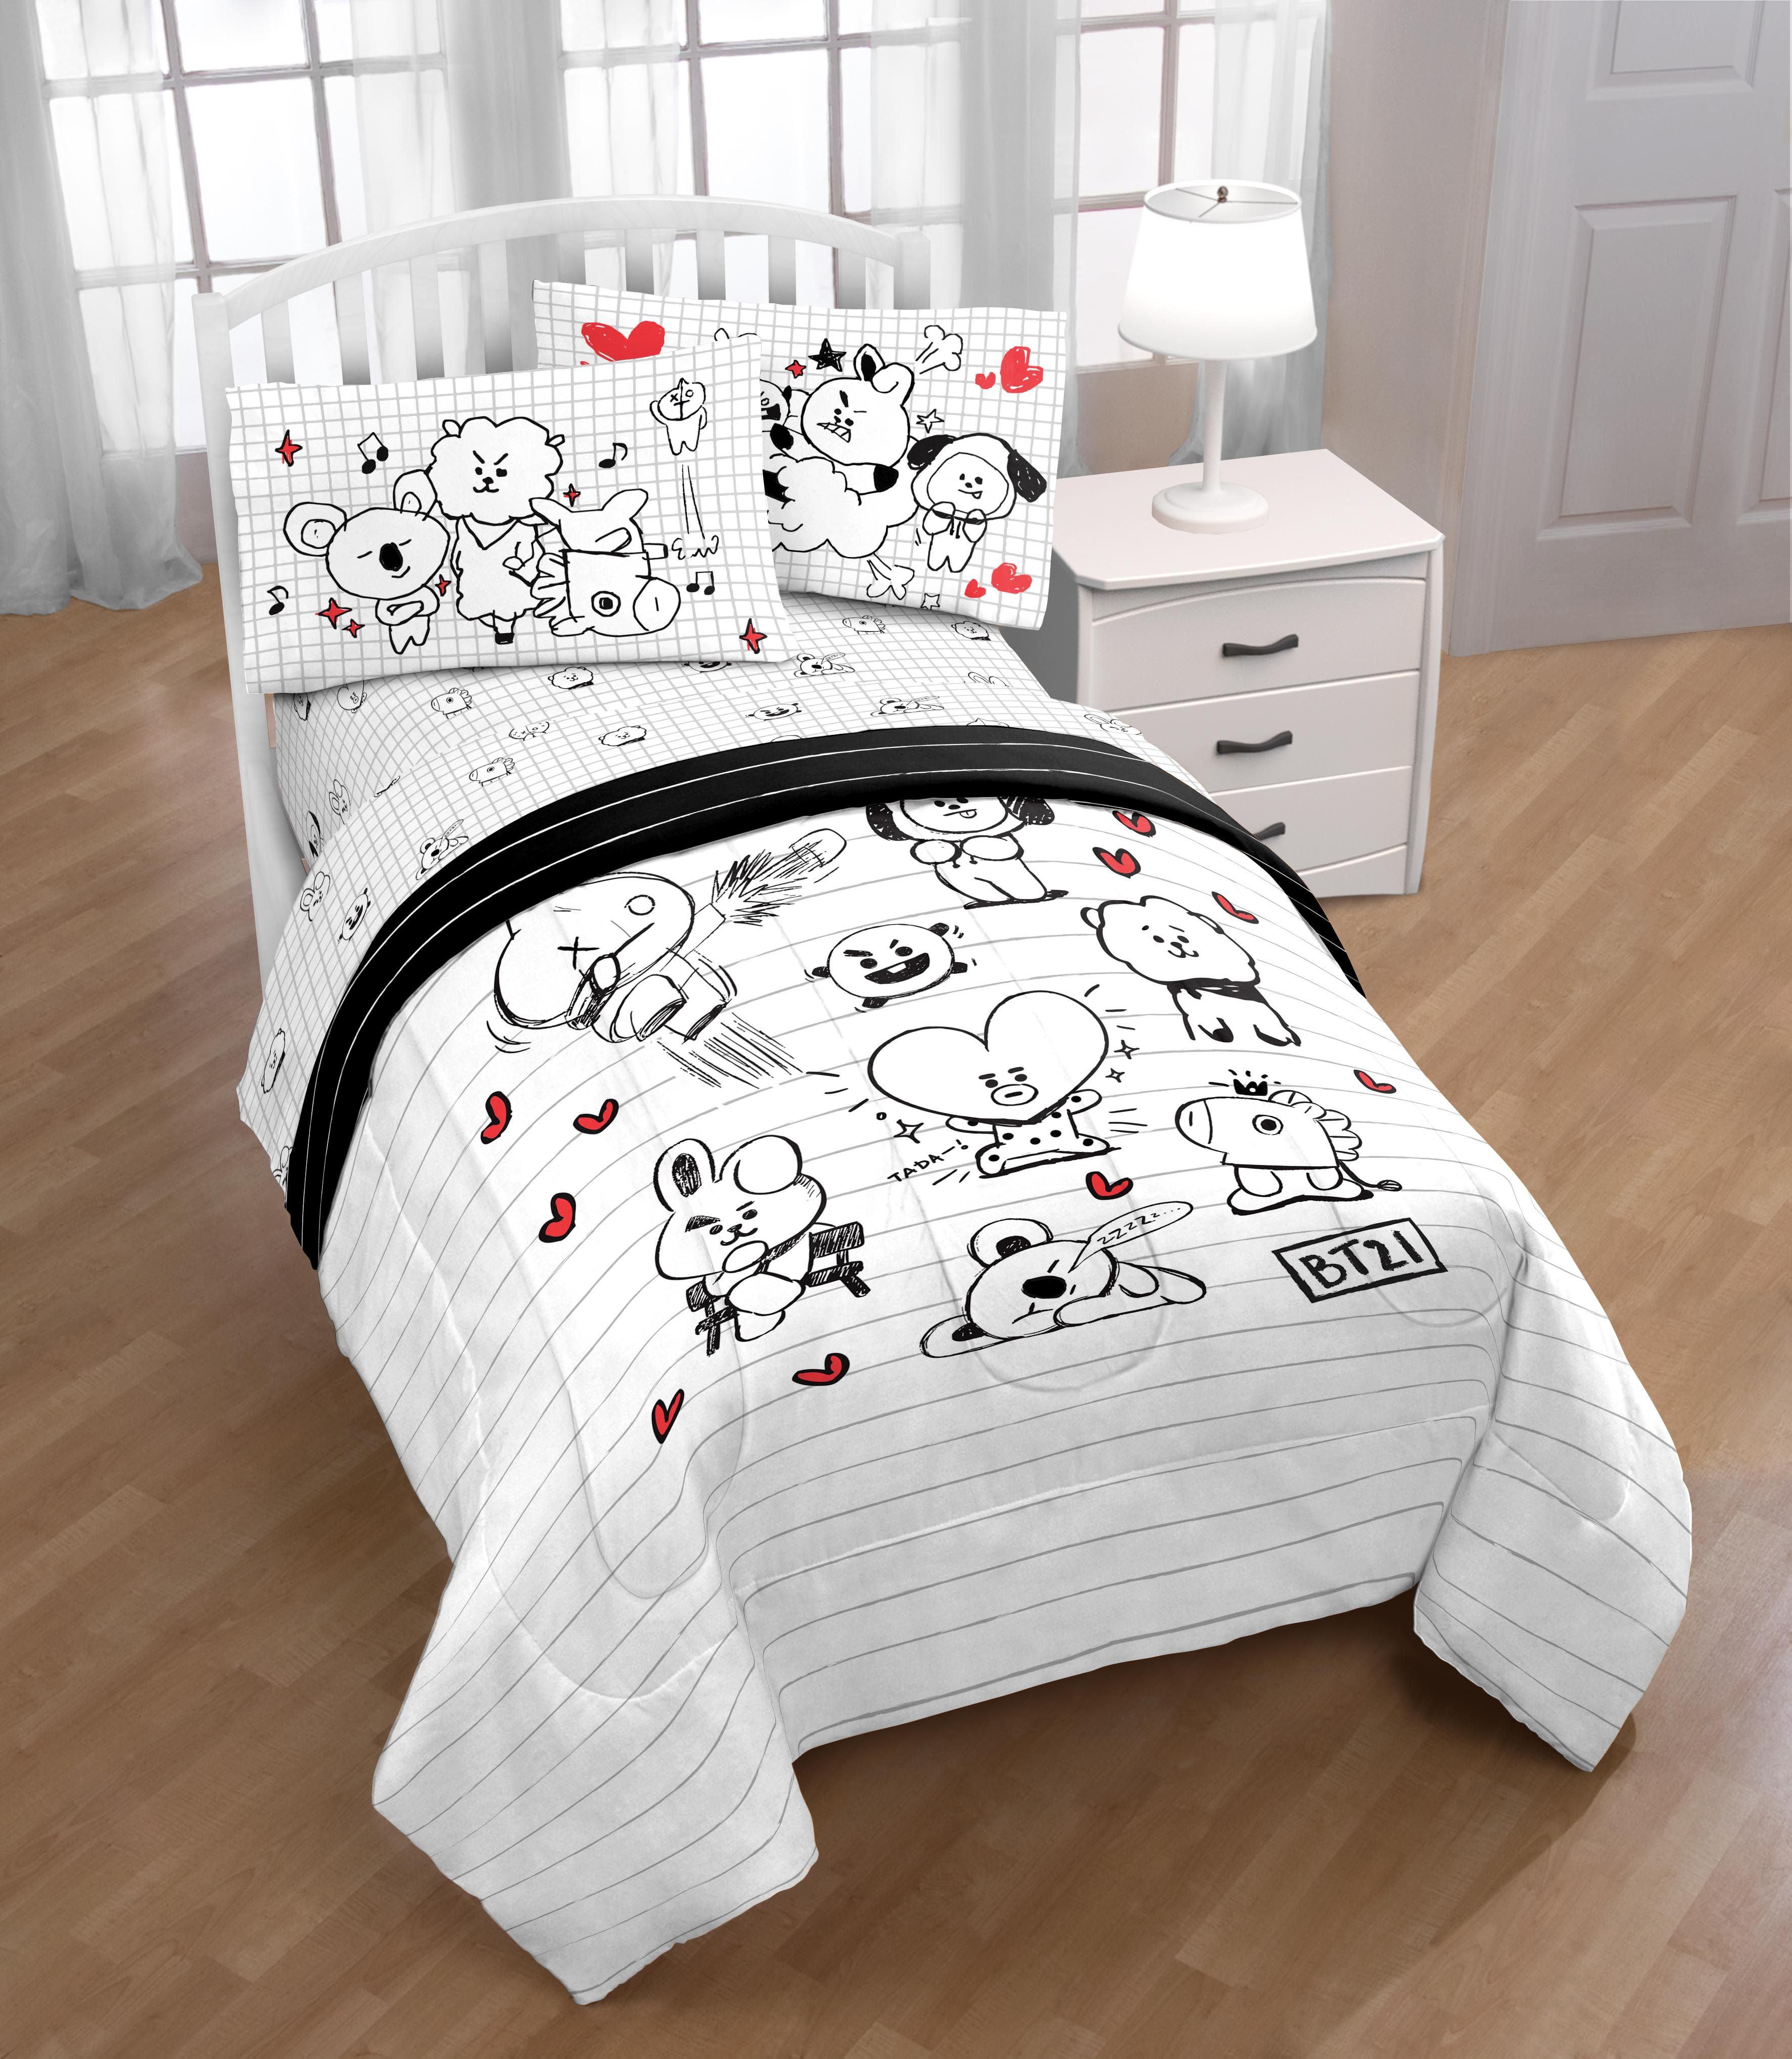 Bt21 Black White Doodle Twin Bed Set Walmart Com Walmart Com